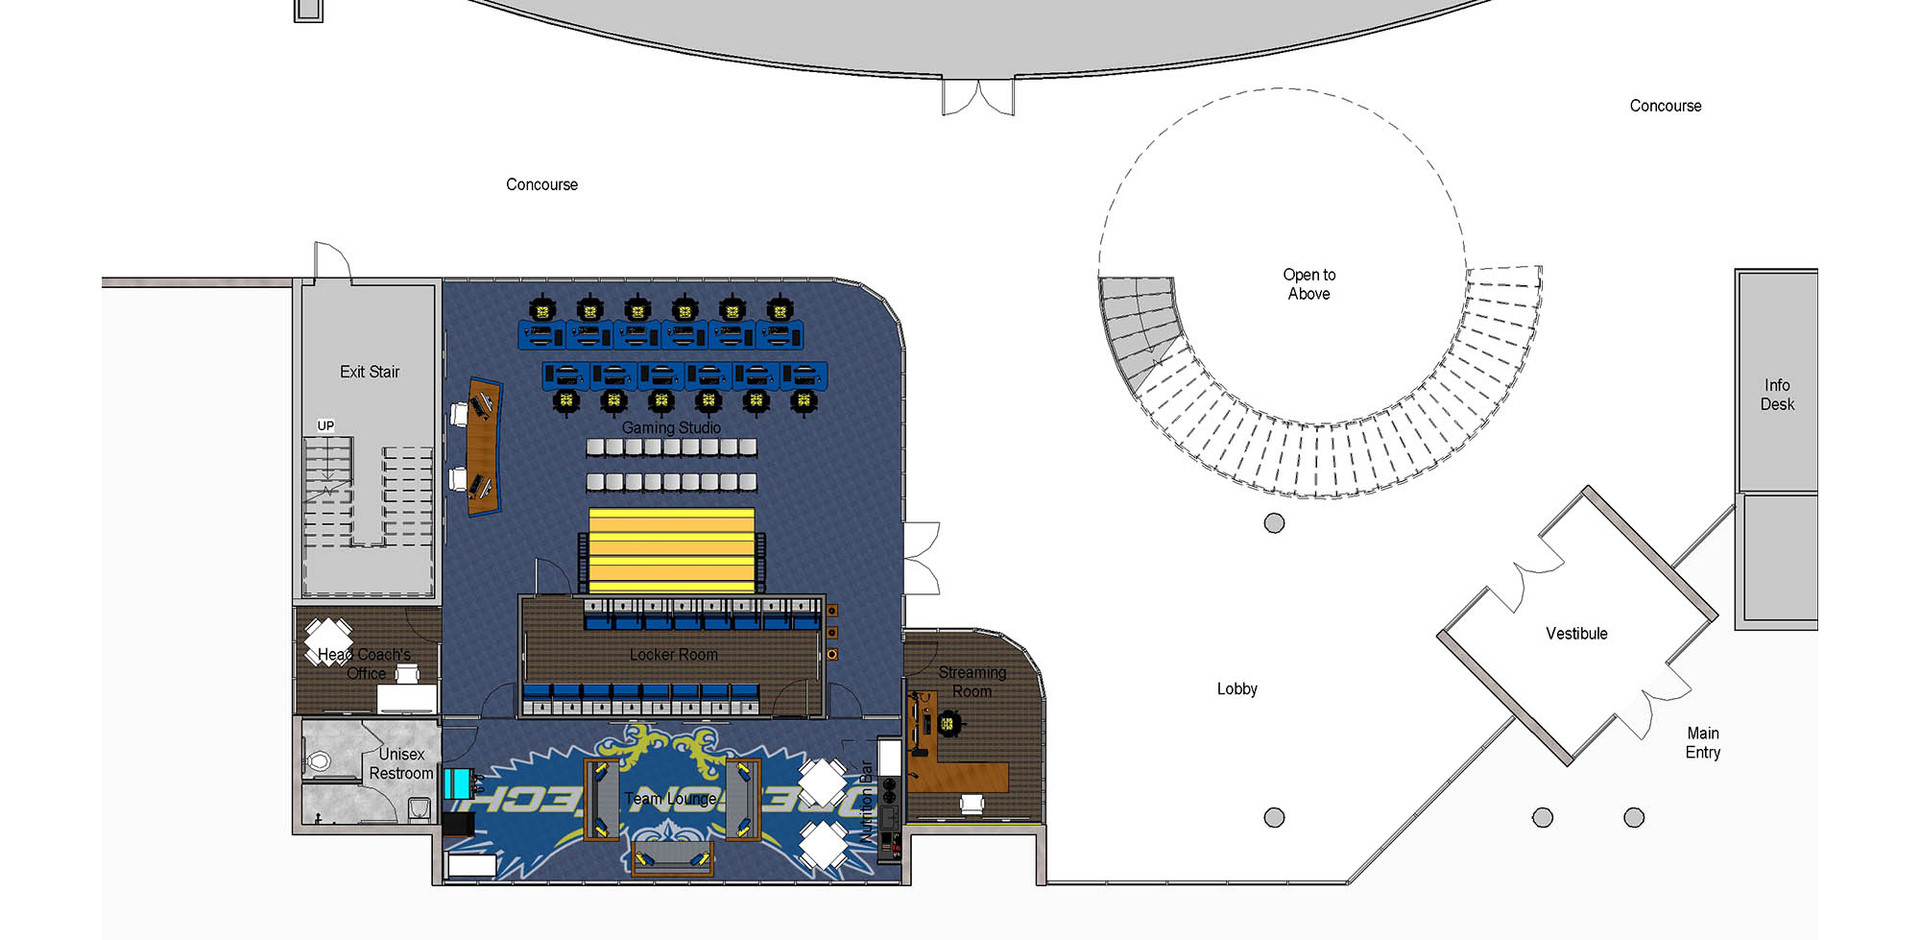 OIT-02-Plan.jpg